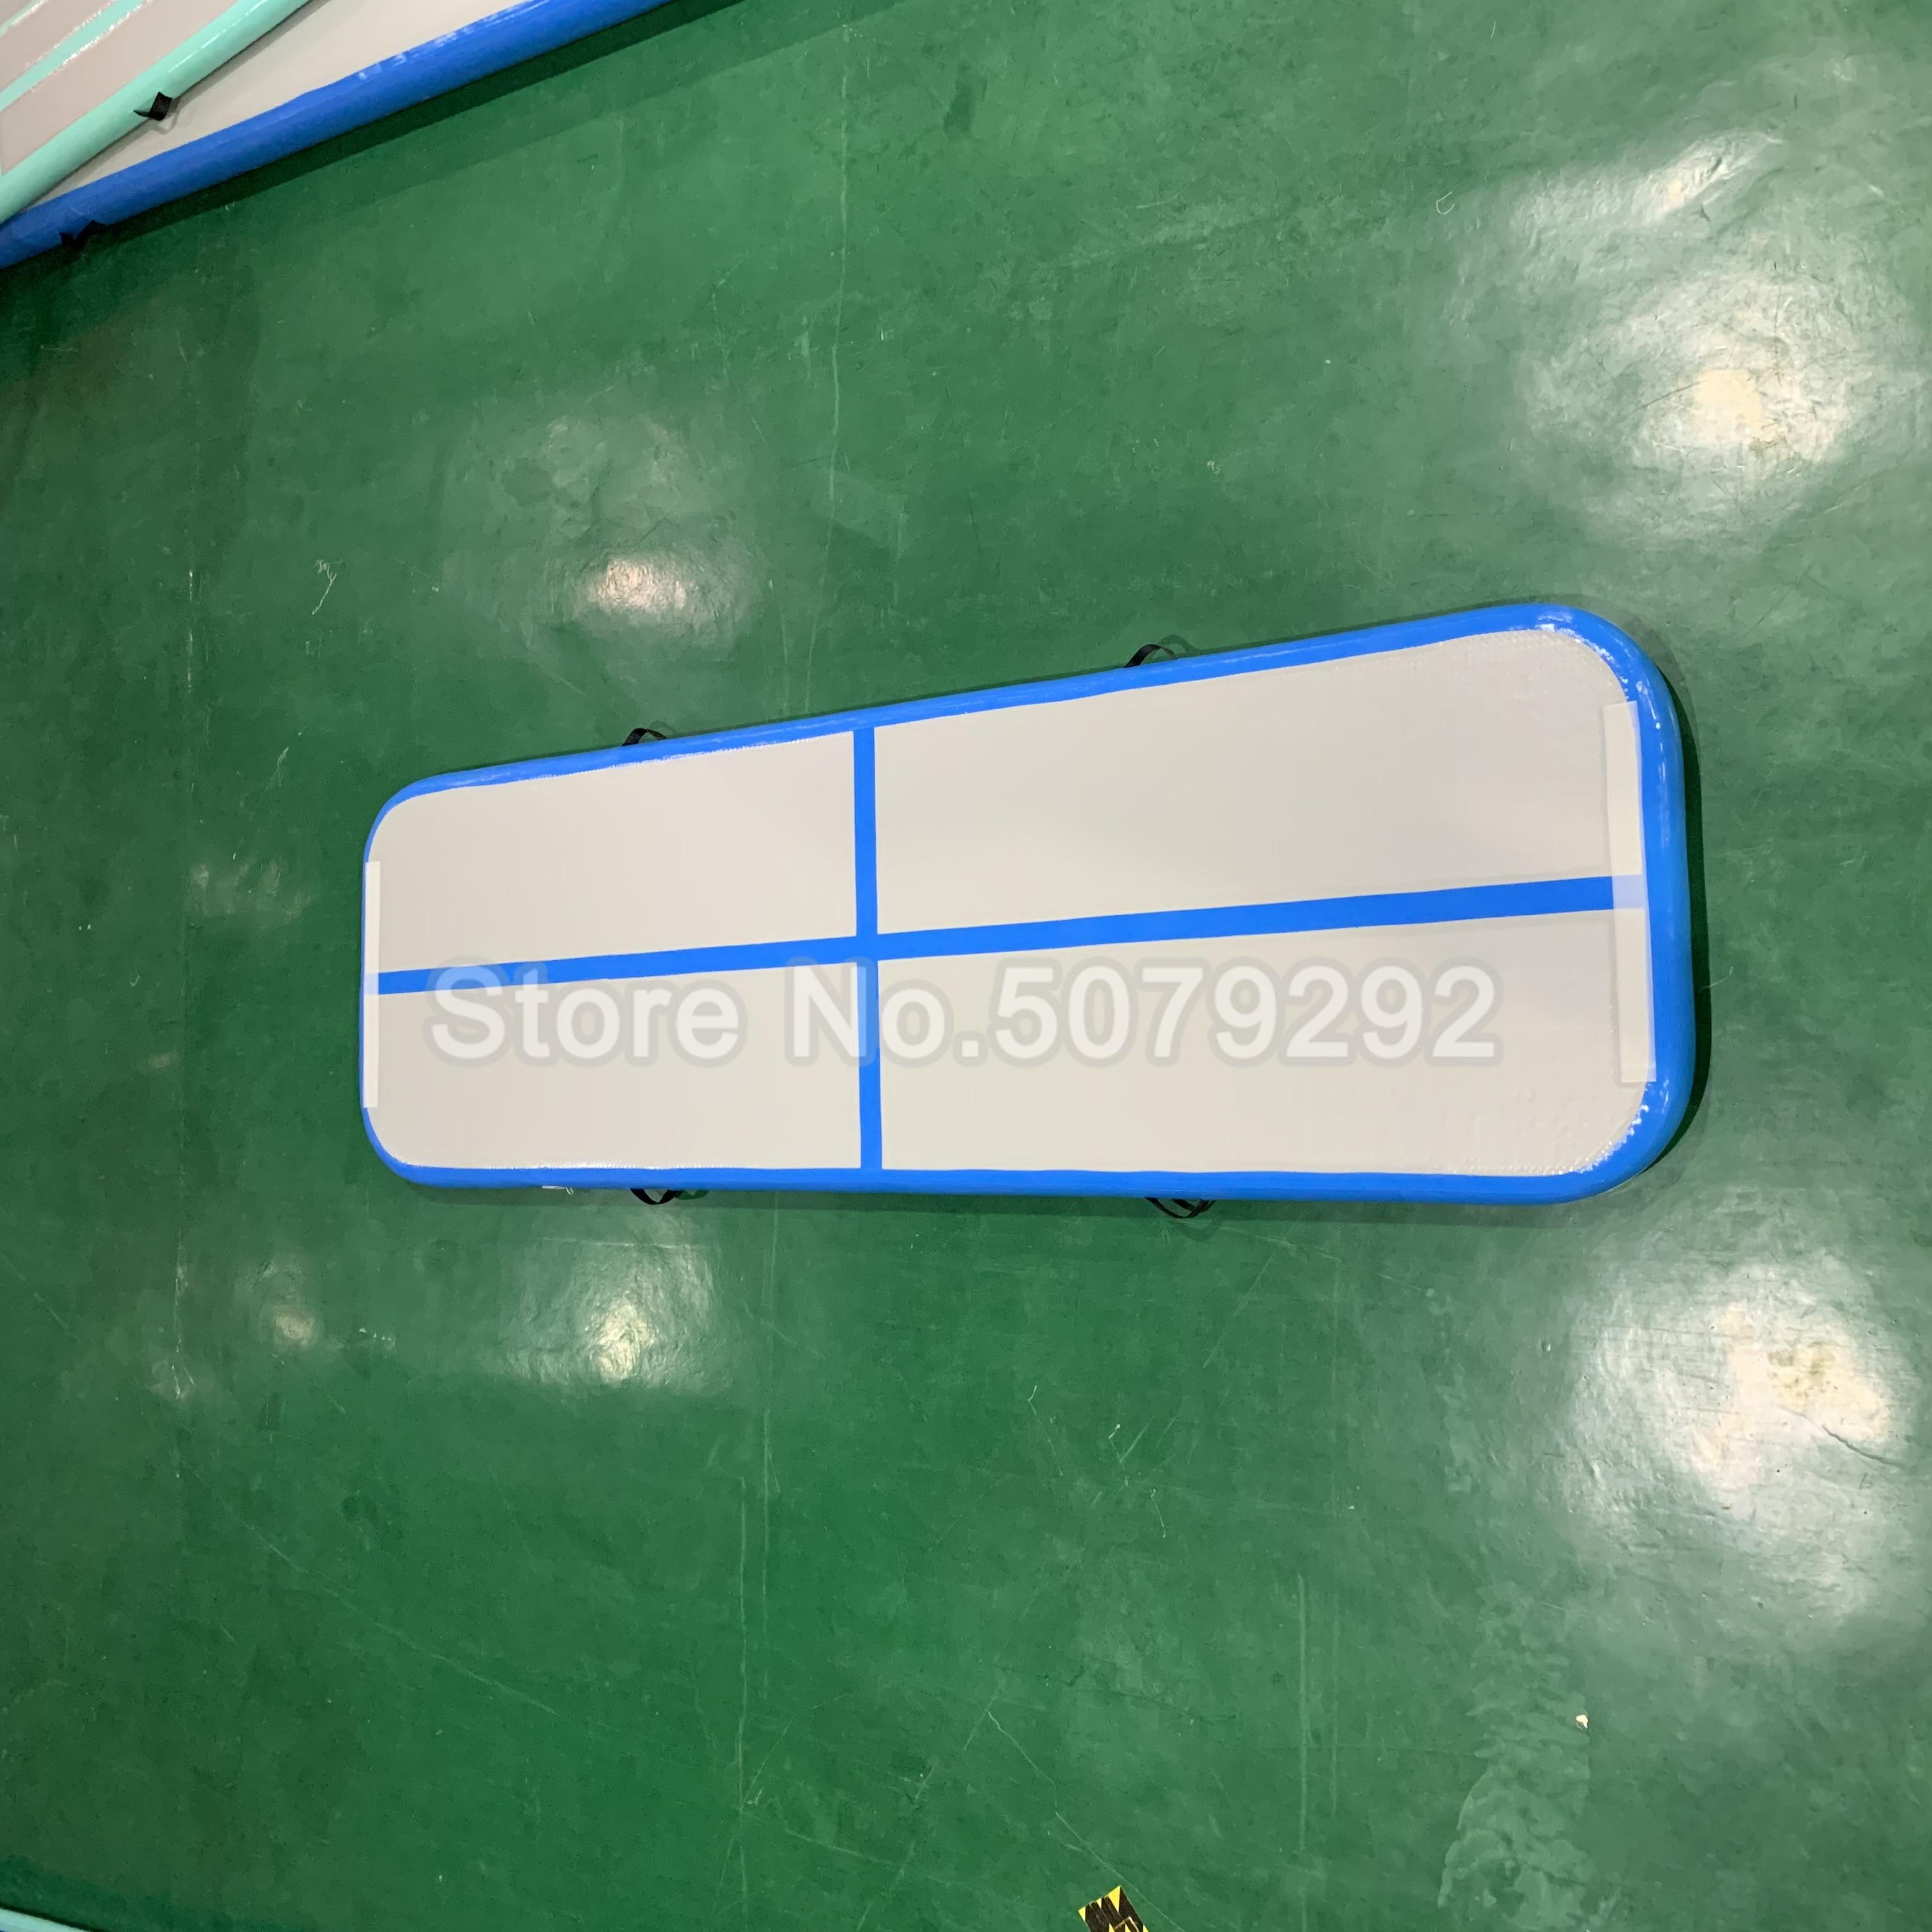 Blue Color Inflatable Airtrack 3M Home Use Air Floor/Bouncing Mat/Crash Air Board DWF Air Block WaterProof Gym Mat/Bouncing Mat